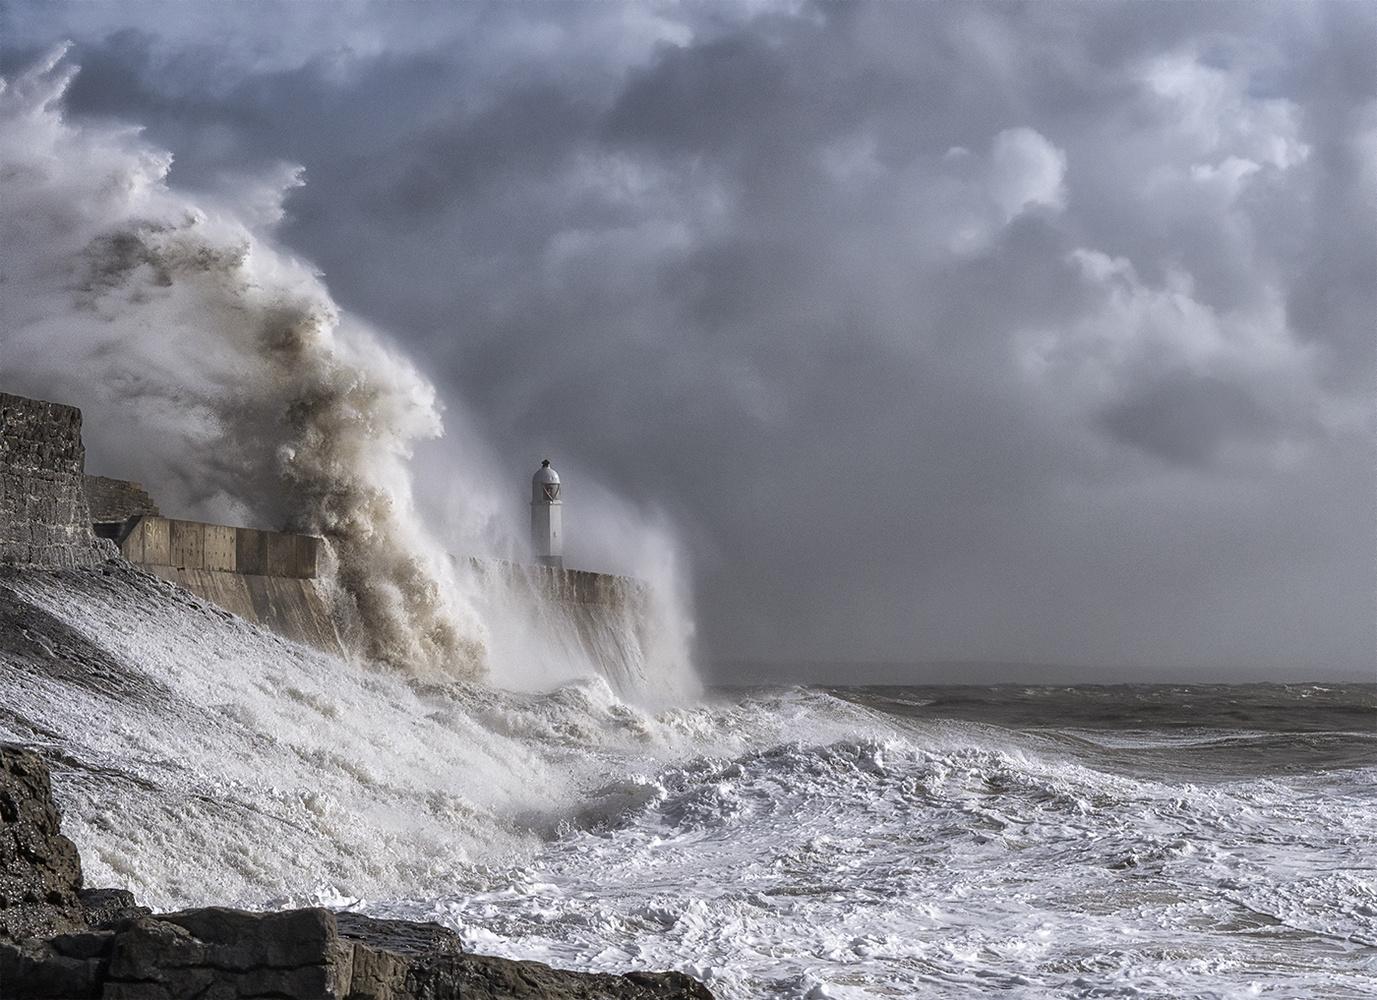 Stormfront by matthew jones